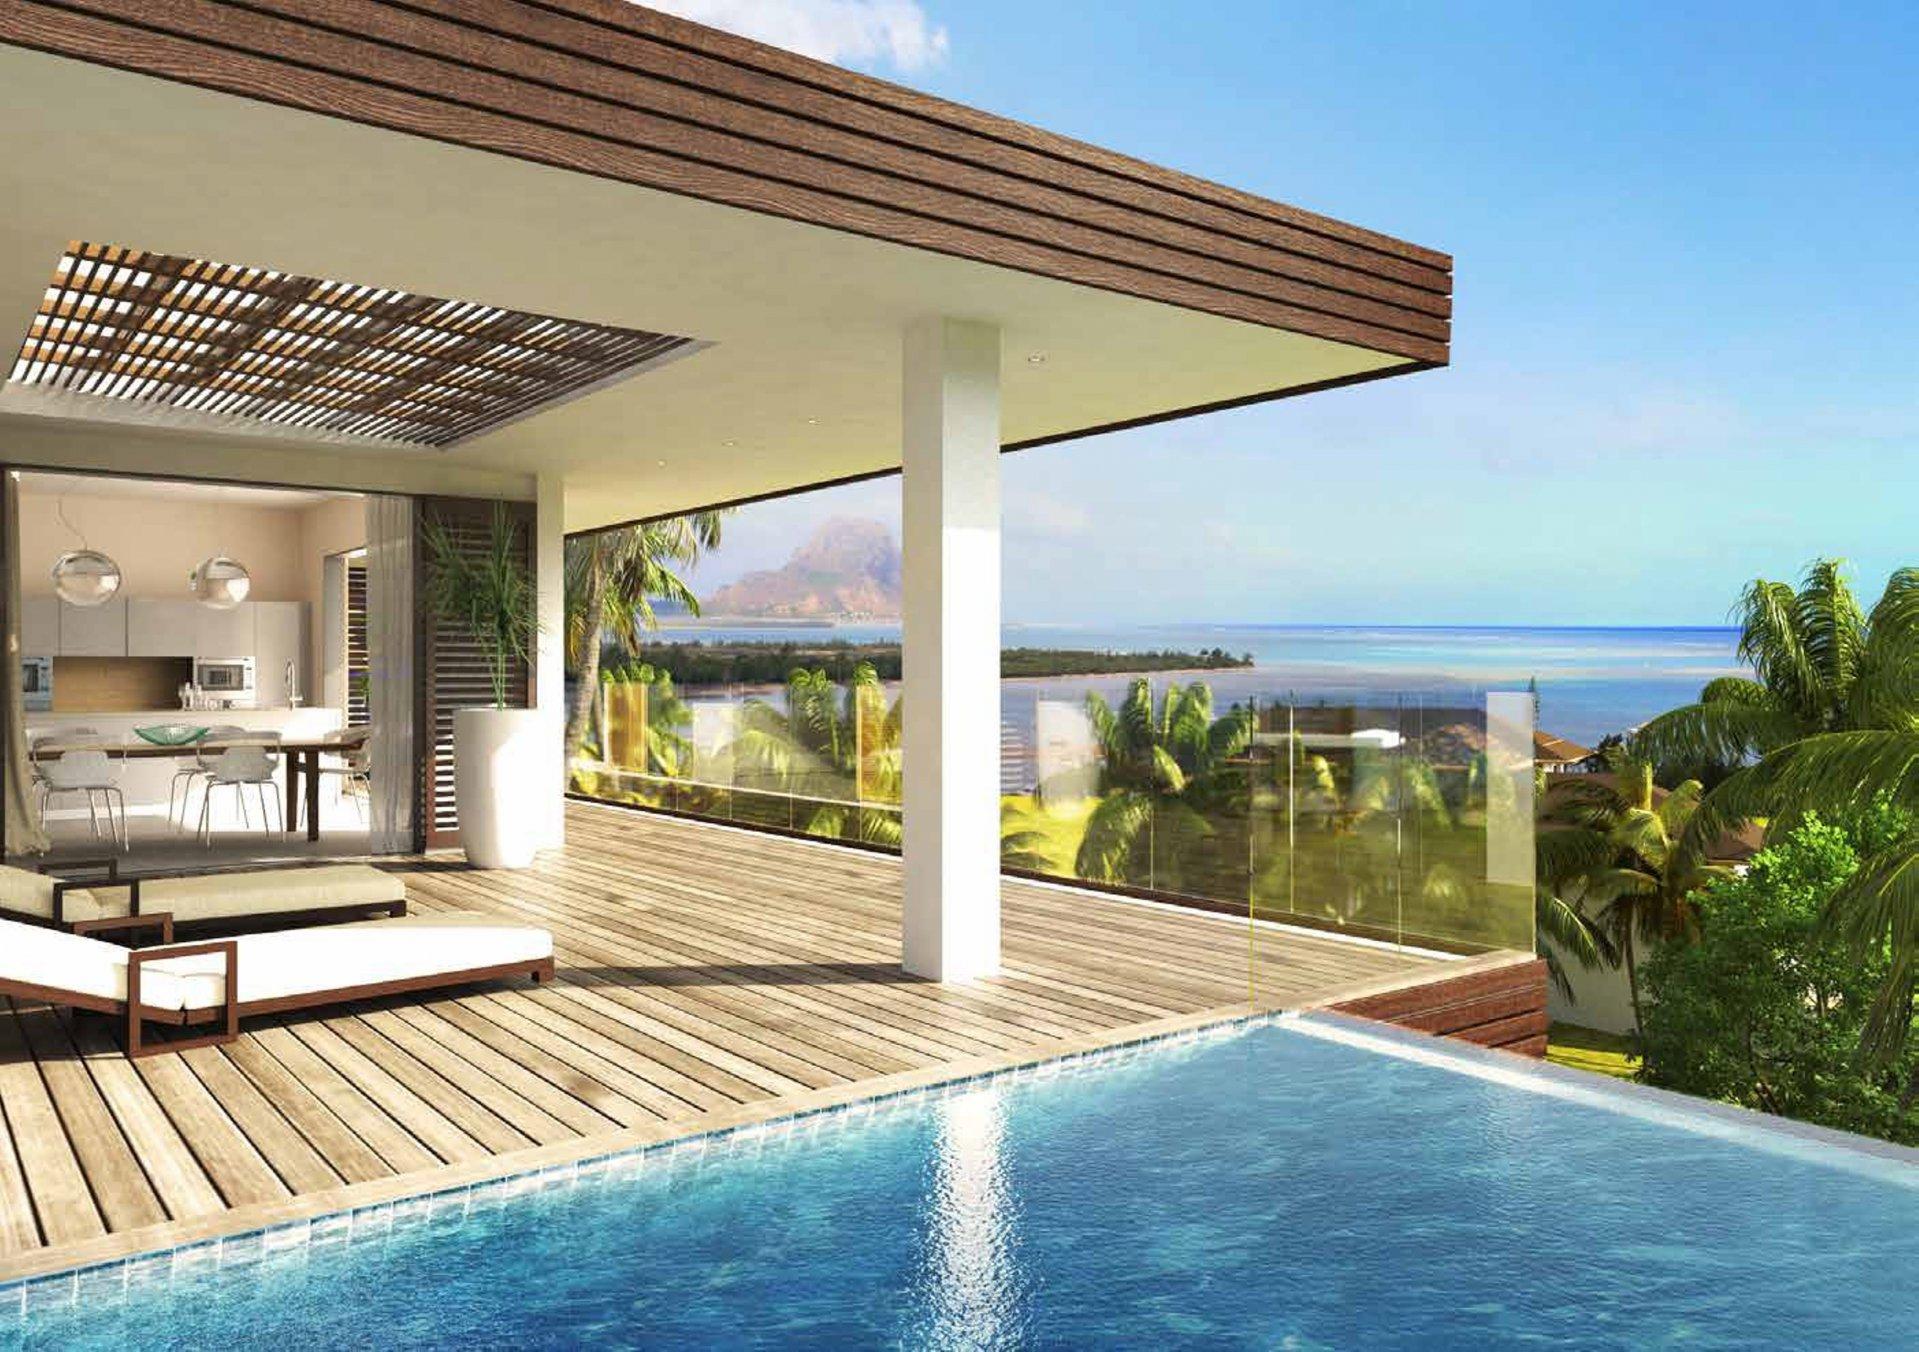 Luxury Villas between sky and sea